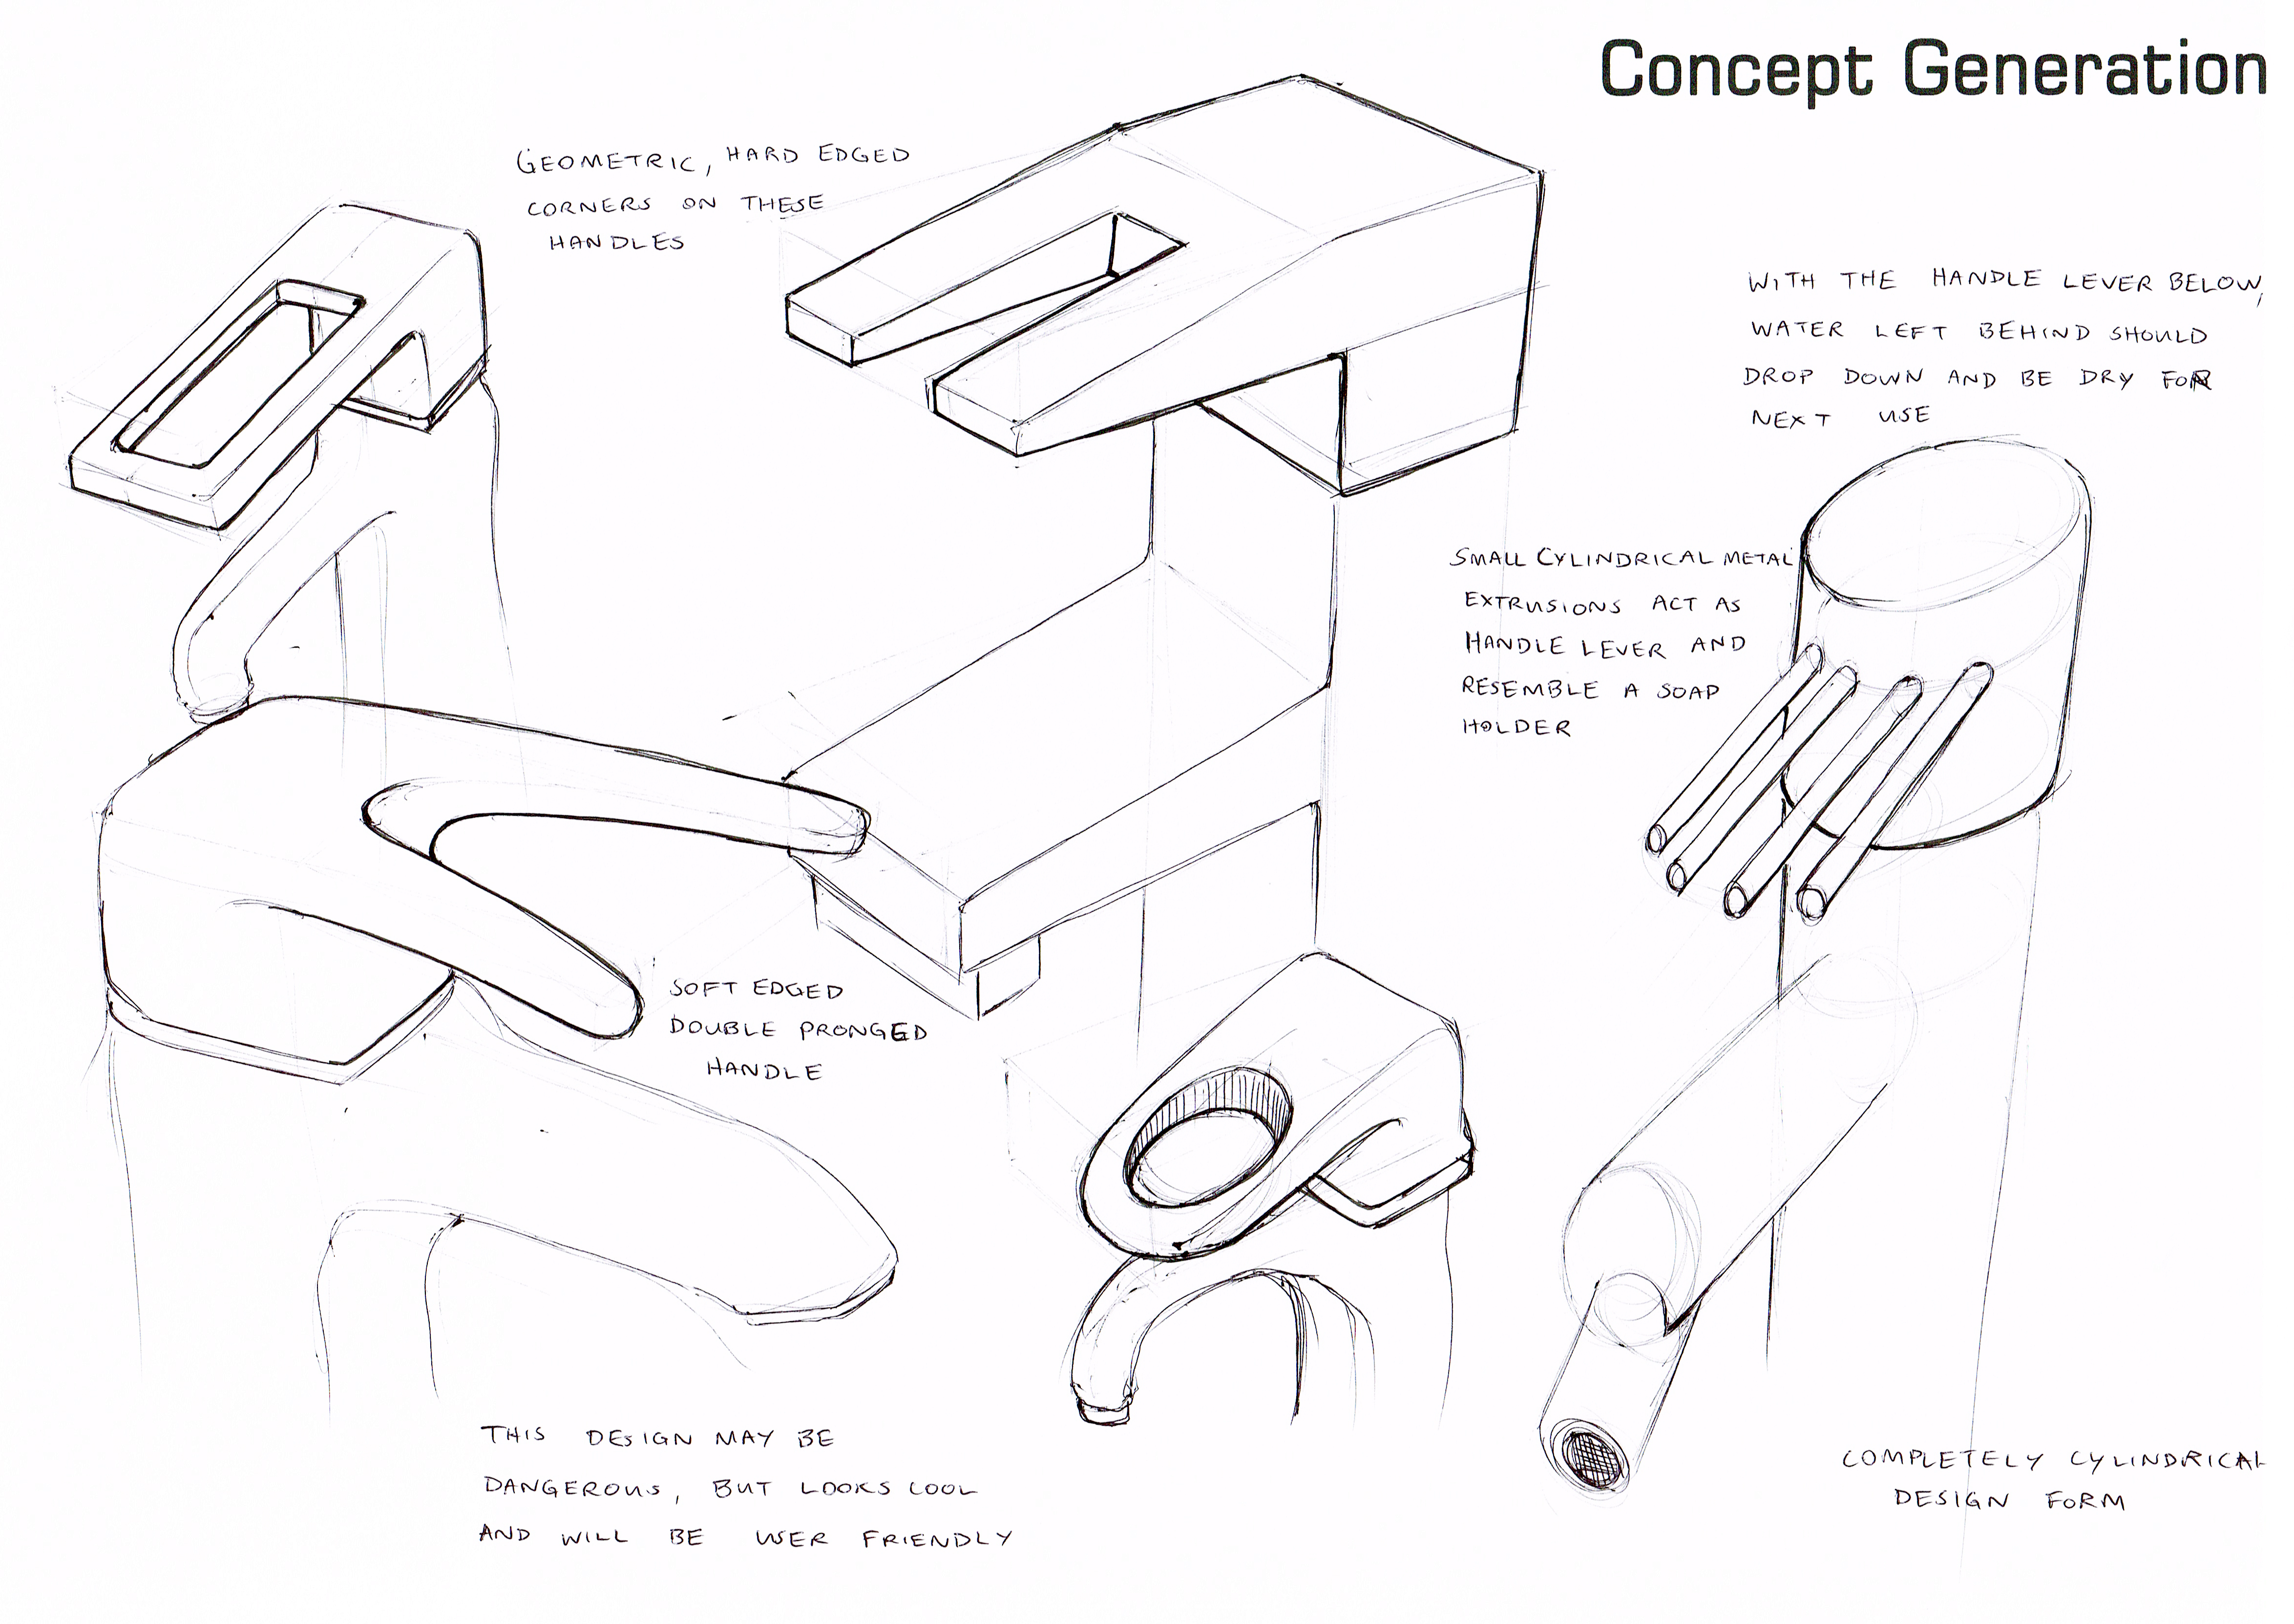 Concept Generation 8